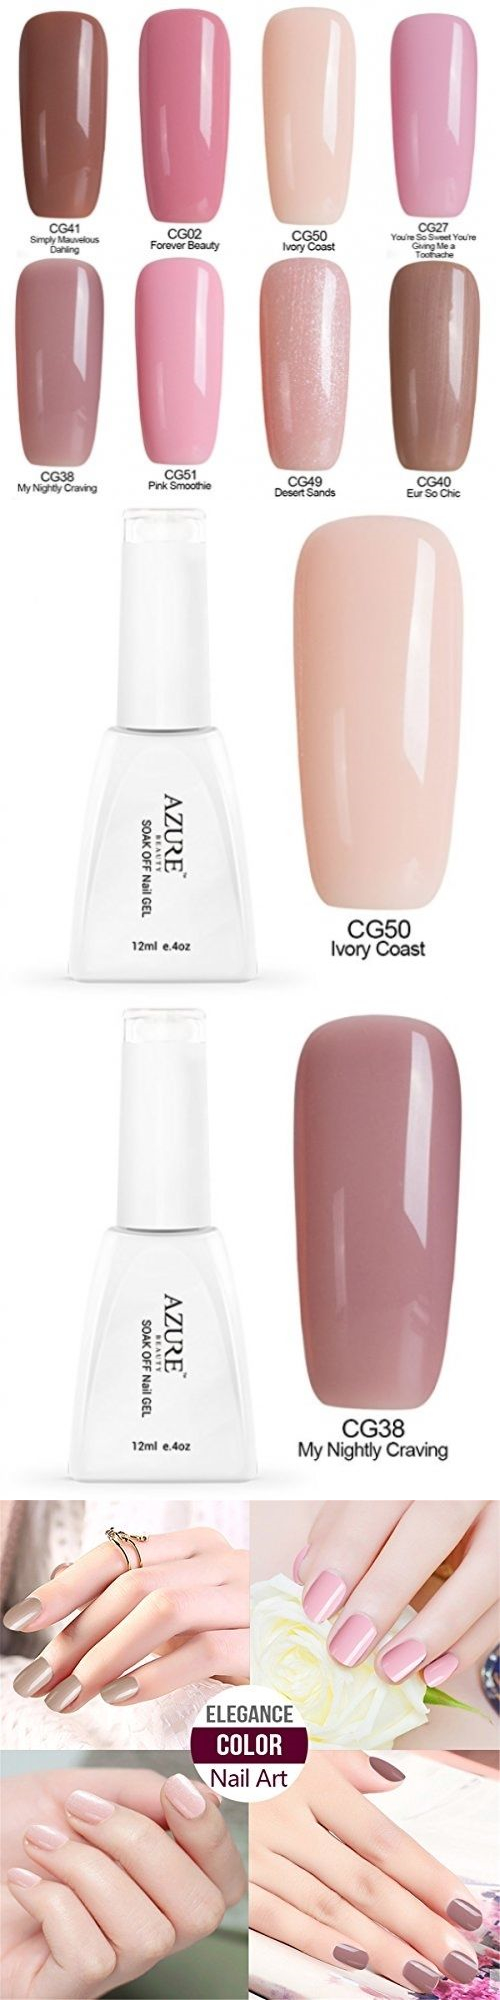 Gel Nails: Azure Beauty Soak Off Uv Led Gel Nail Polish 8 Pcs 12Ml ...